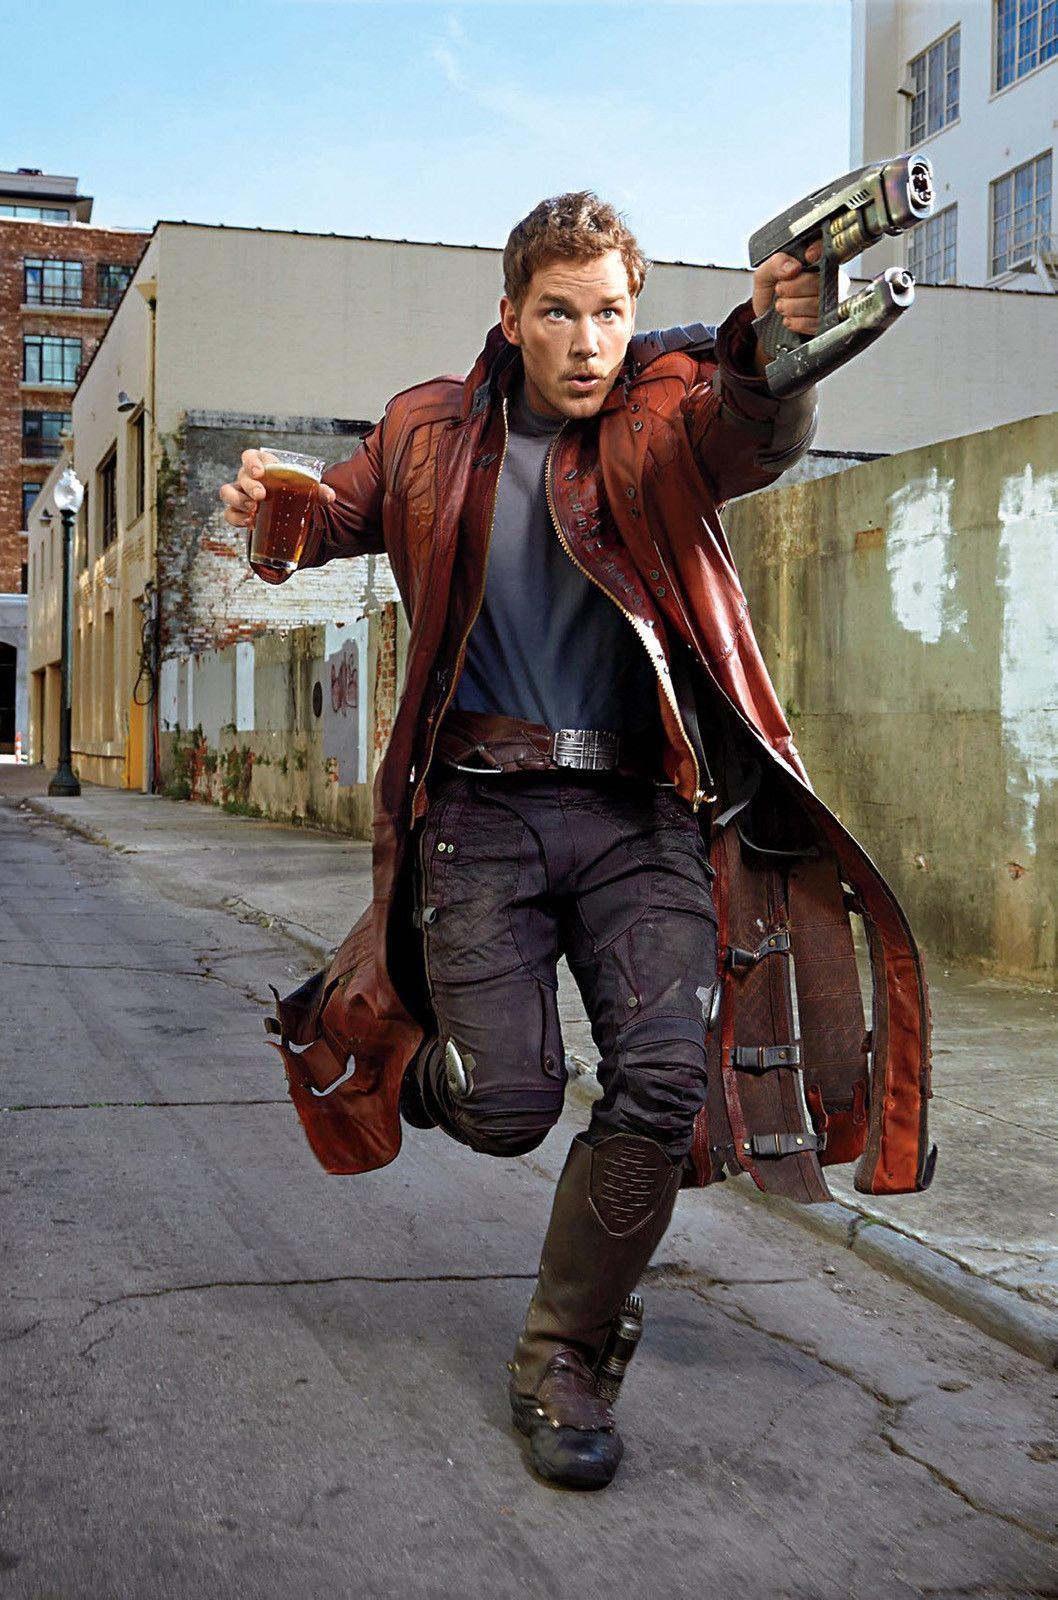 L Hilarant Message De Chris Pratt A Propos De Les Gardiens De La